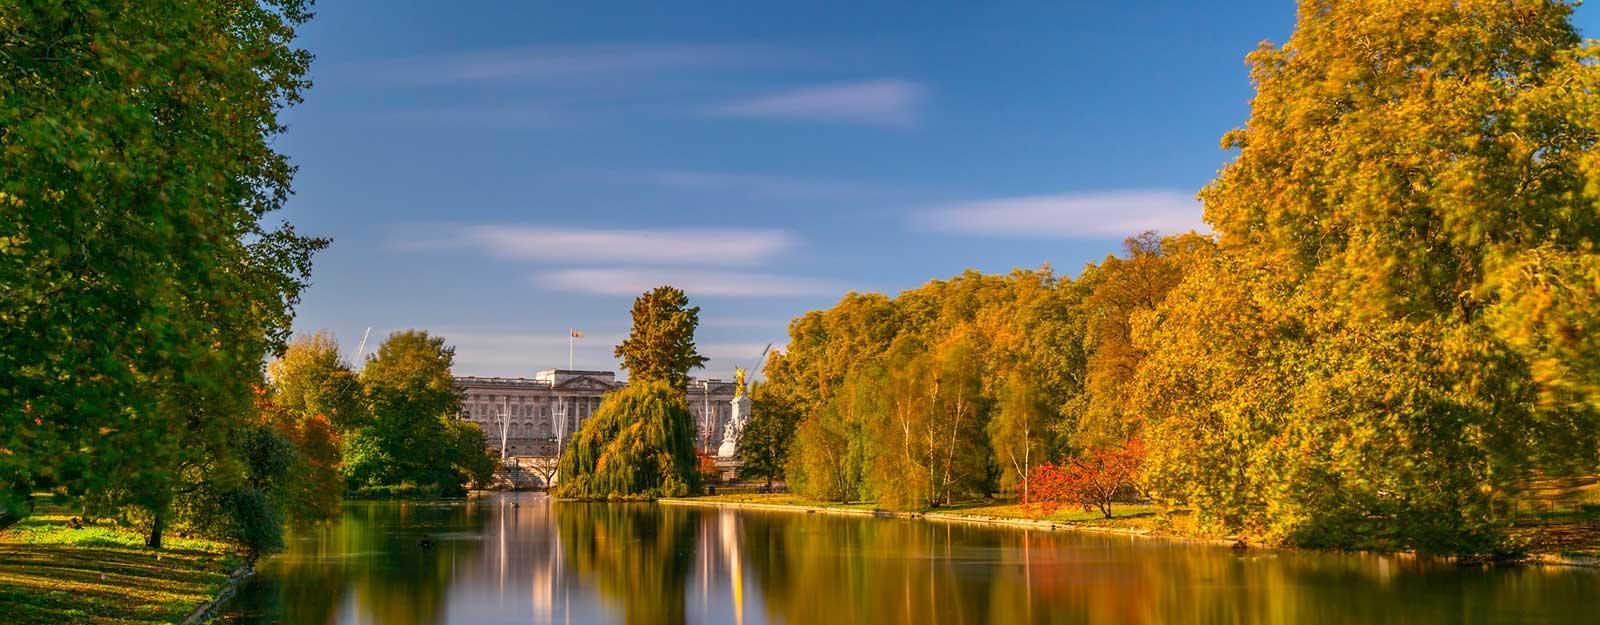 Buckingham Palace in autumn